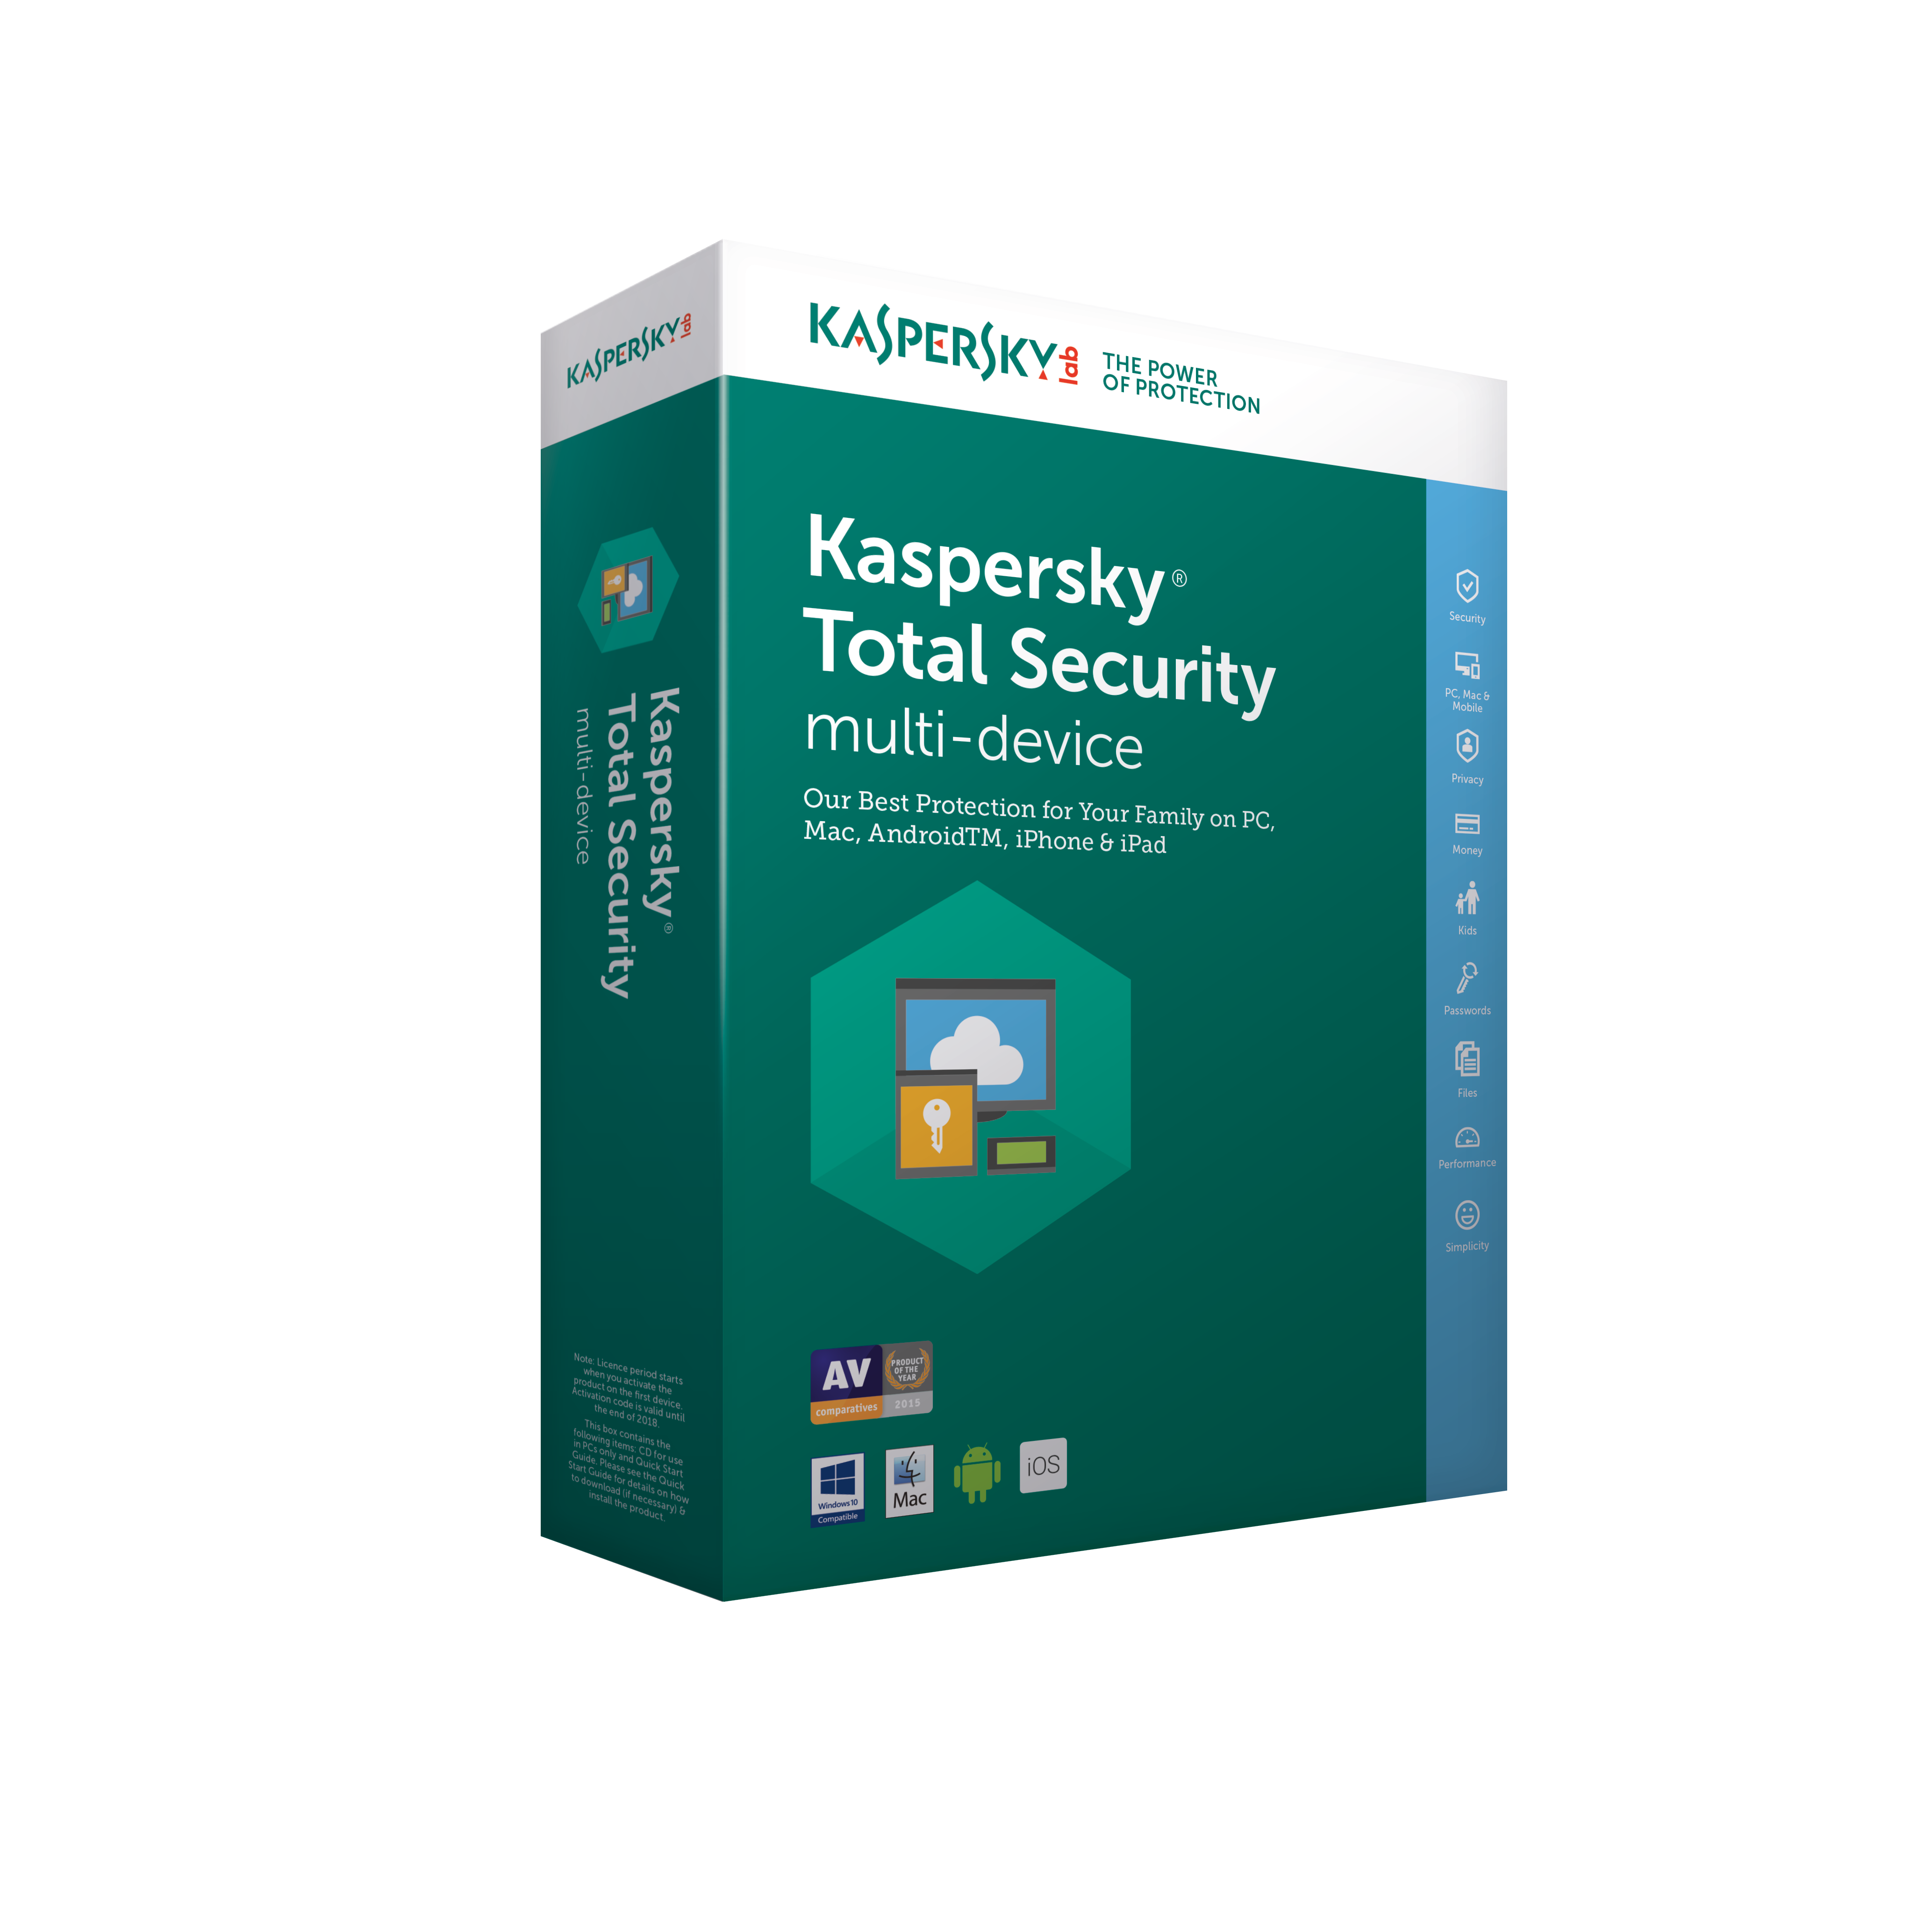 Kaspersky Total Security MD 2018 CZ, 1x, 2 roky